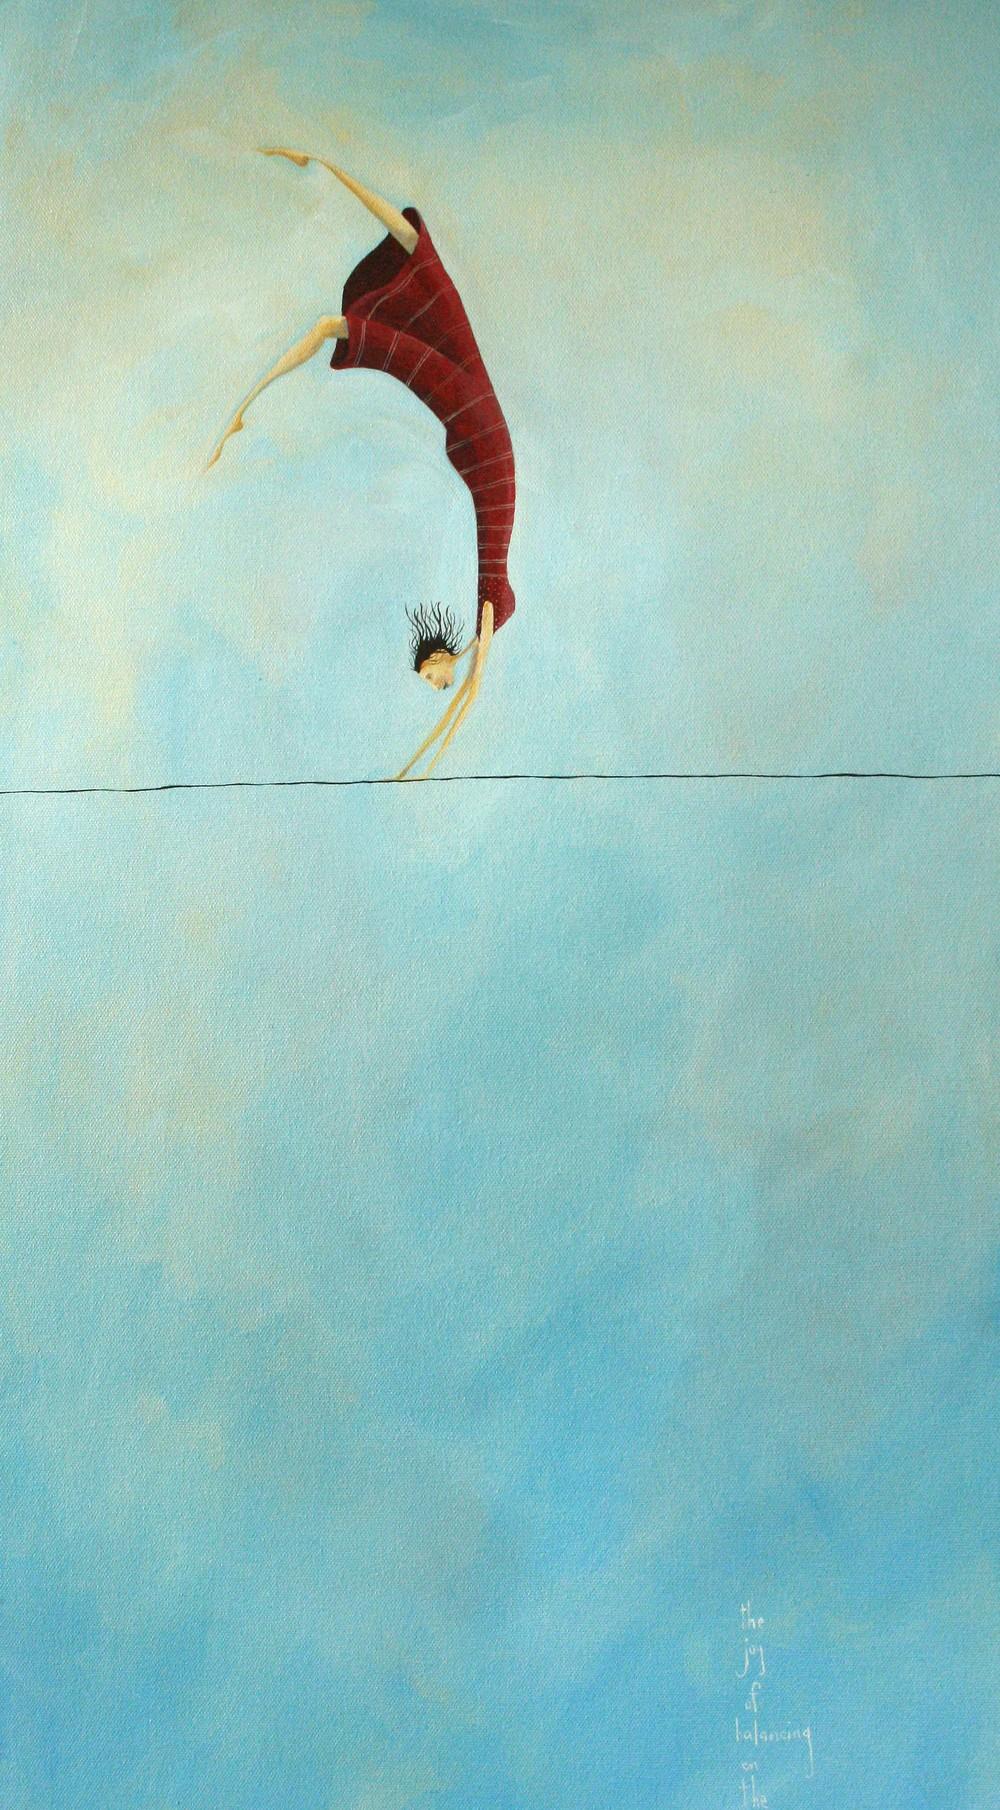 the joy of balancing on the edge of life